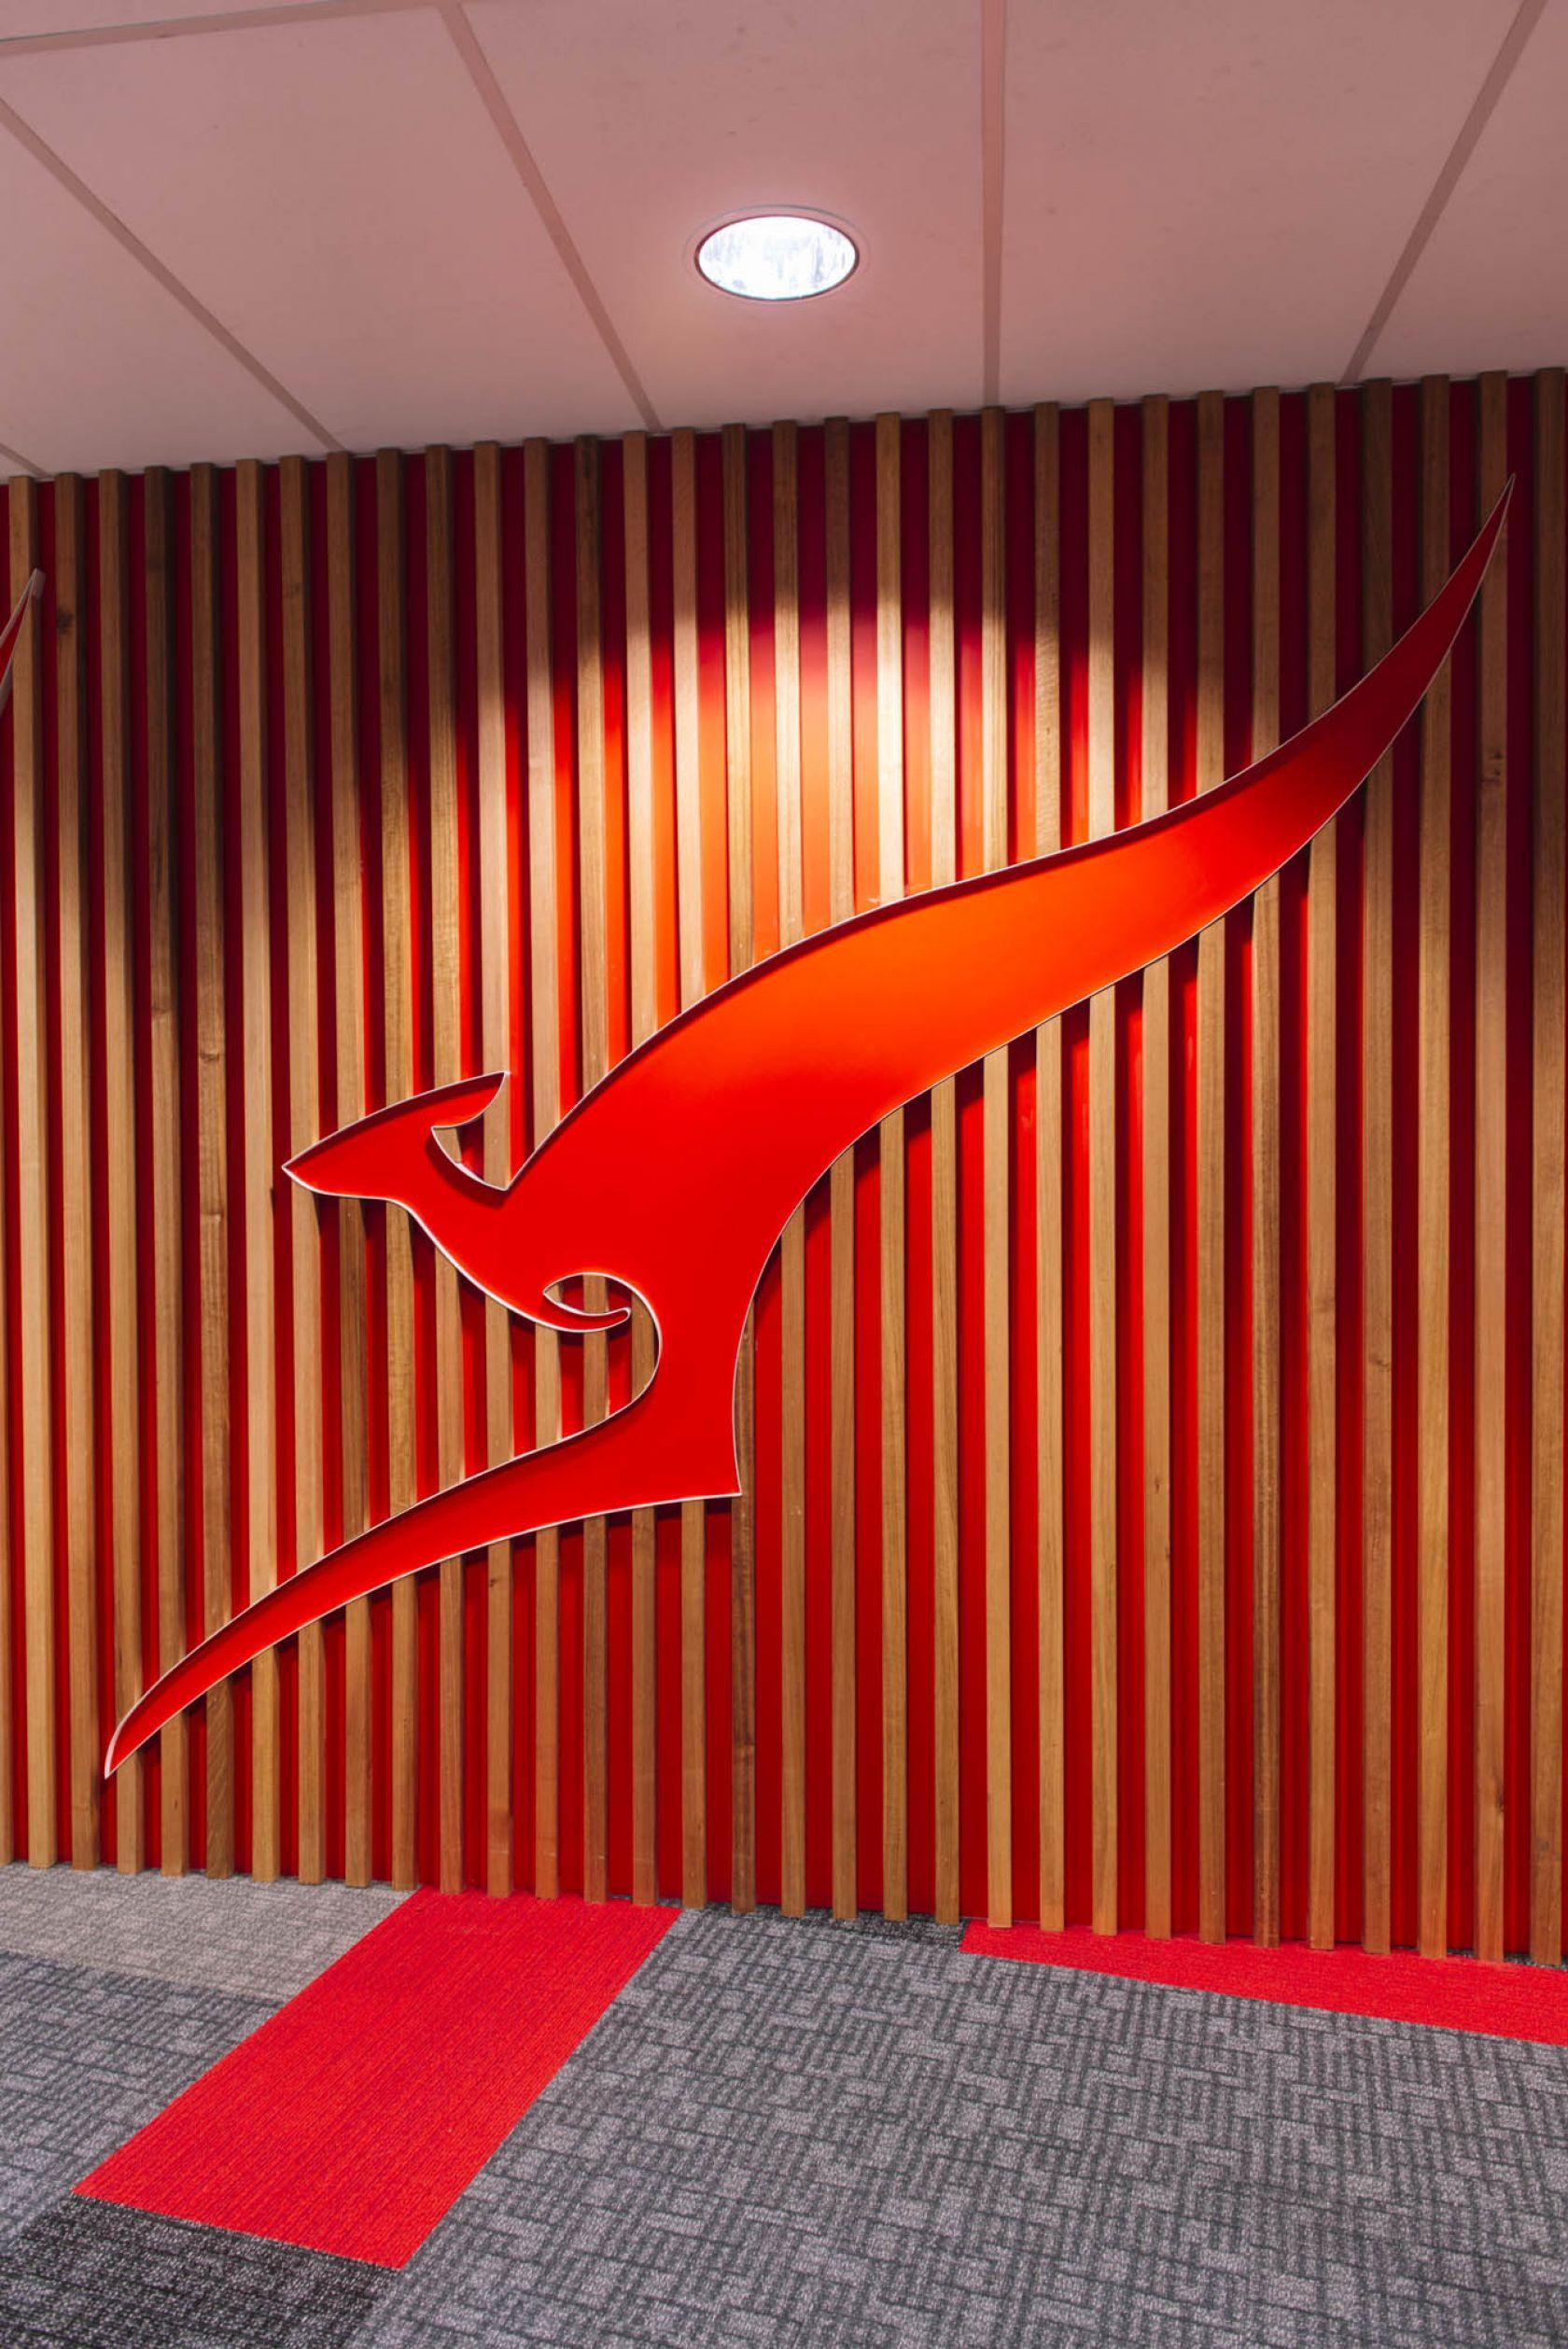 qantas hobart office fitout kangaroo logo